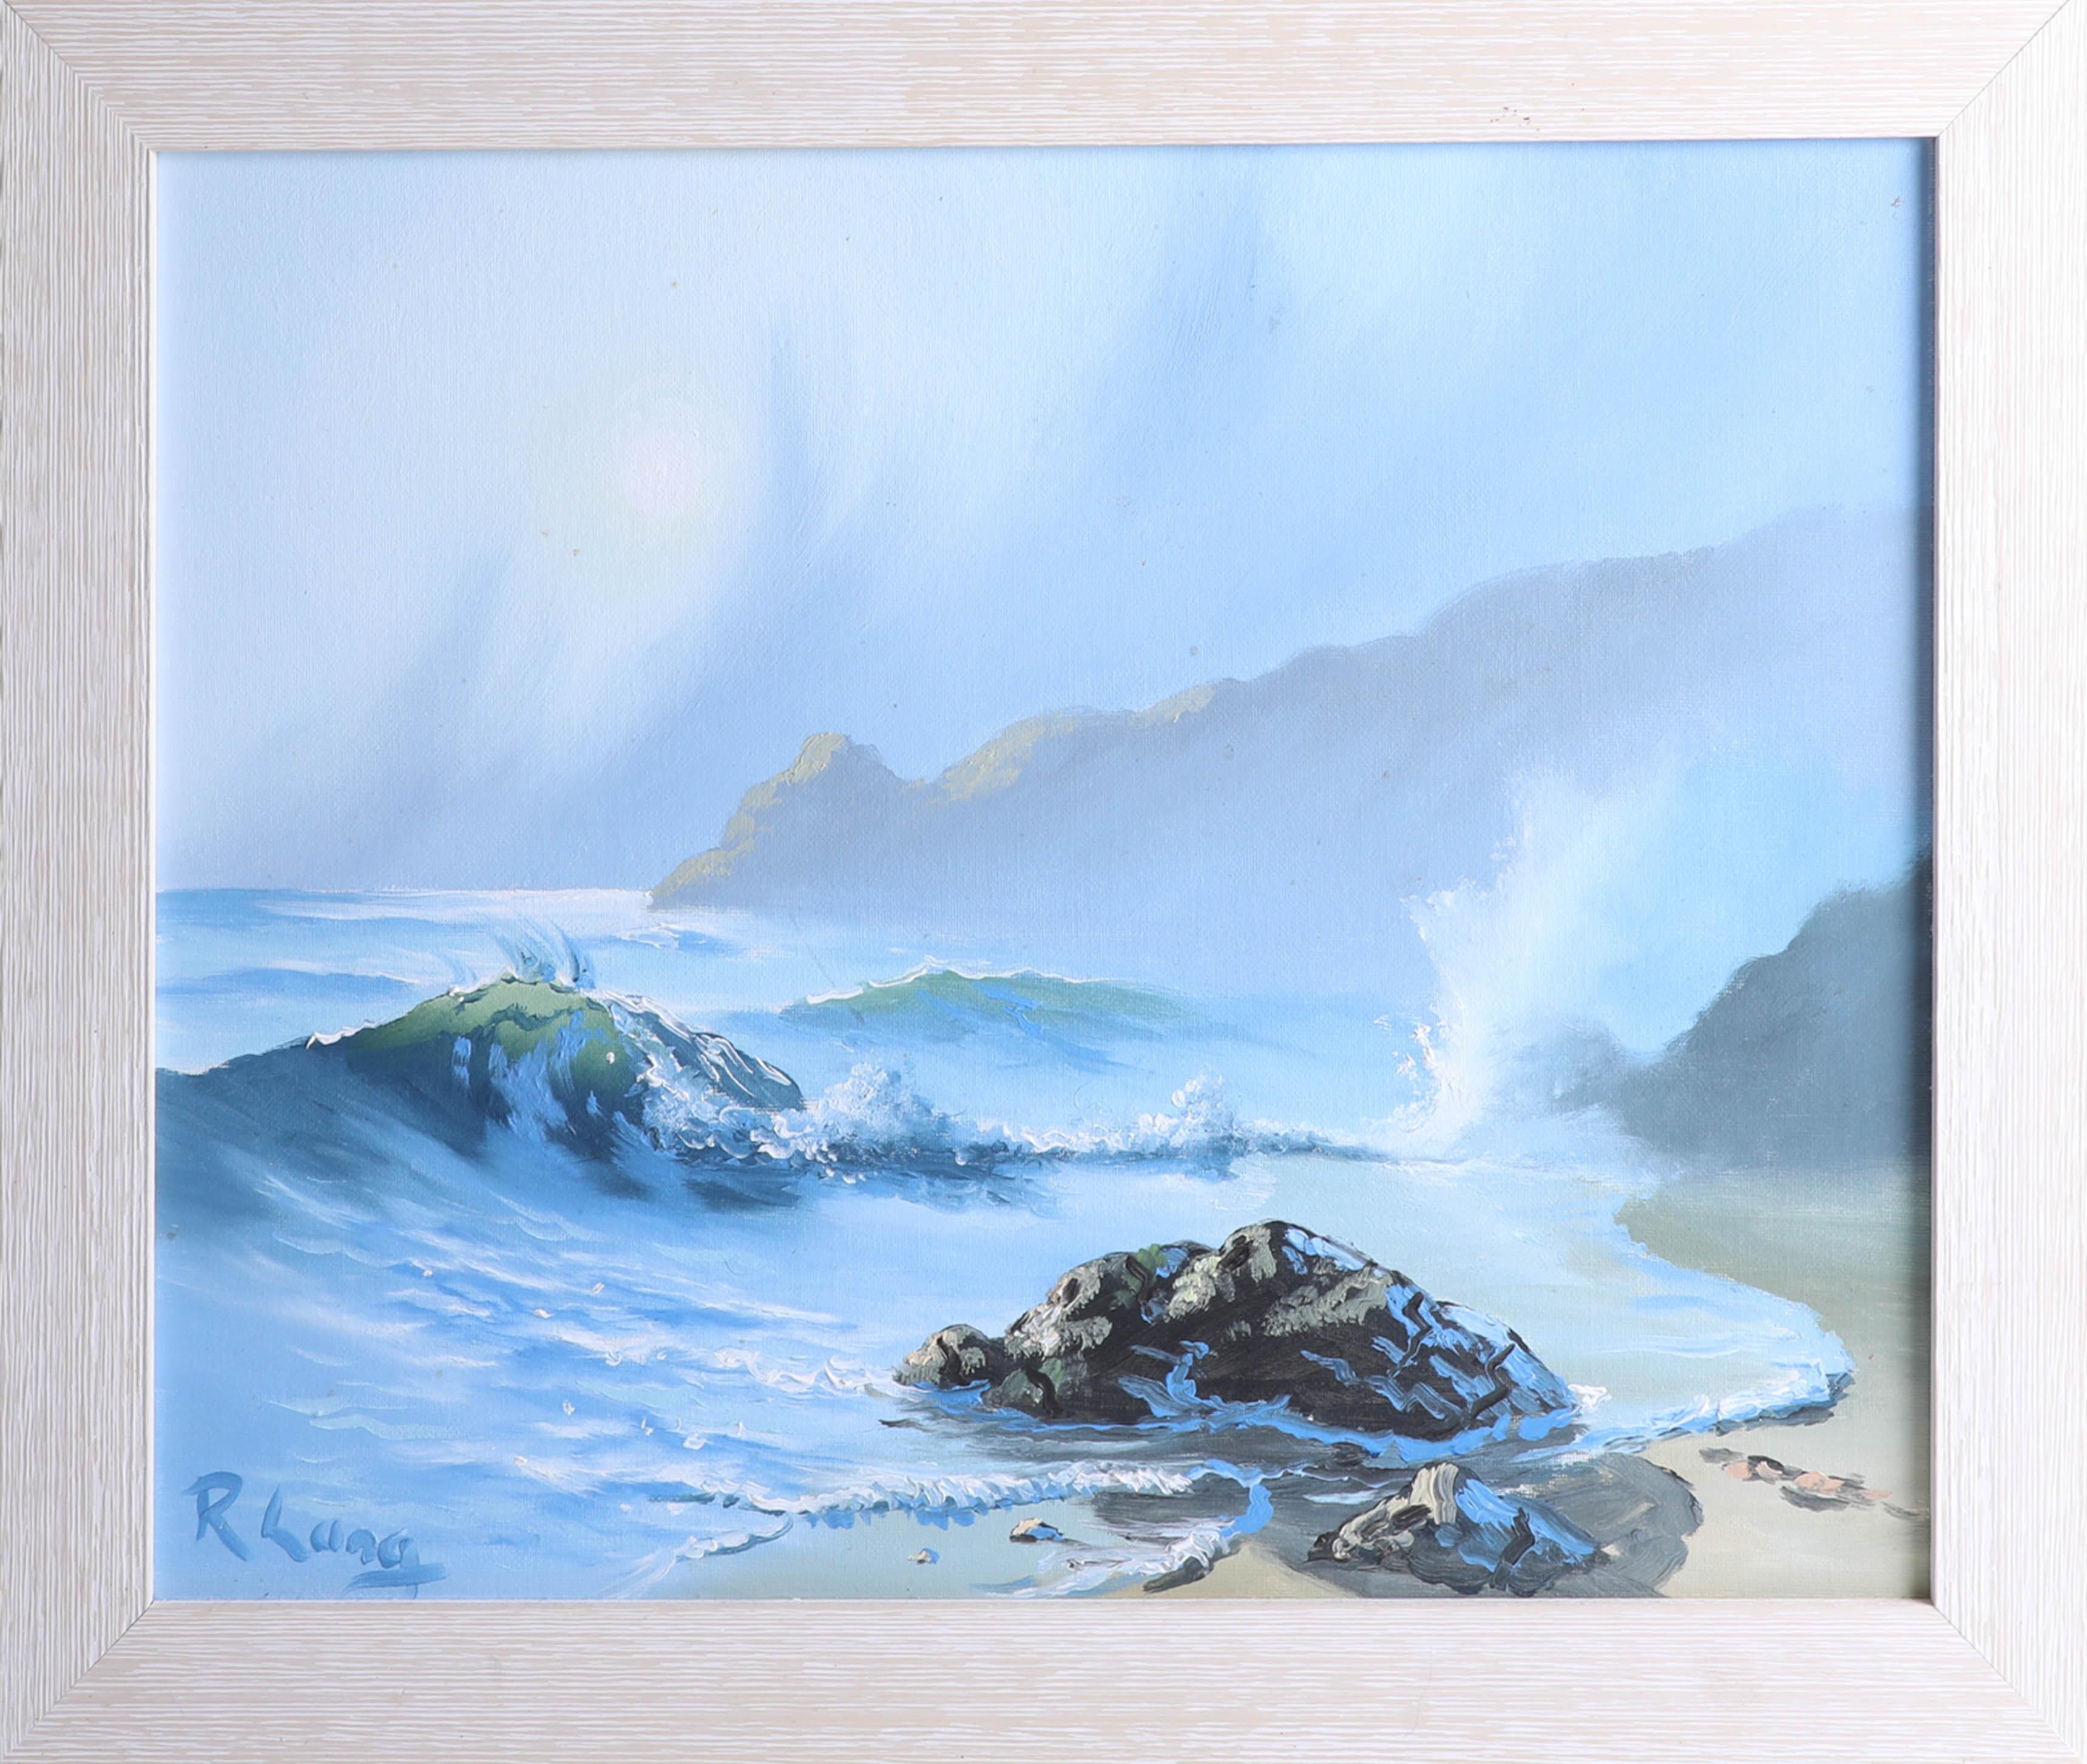 Lot 013 - Roy Lang, 3 signed Seascapes, 40cm x 50cm, framed. Roy Land, (Cornish born) was voted artist of